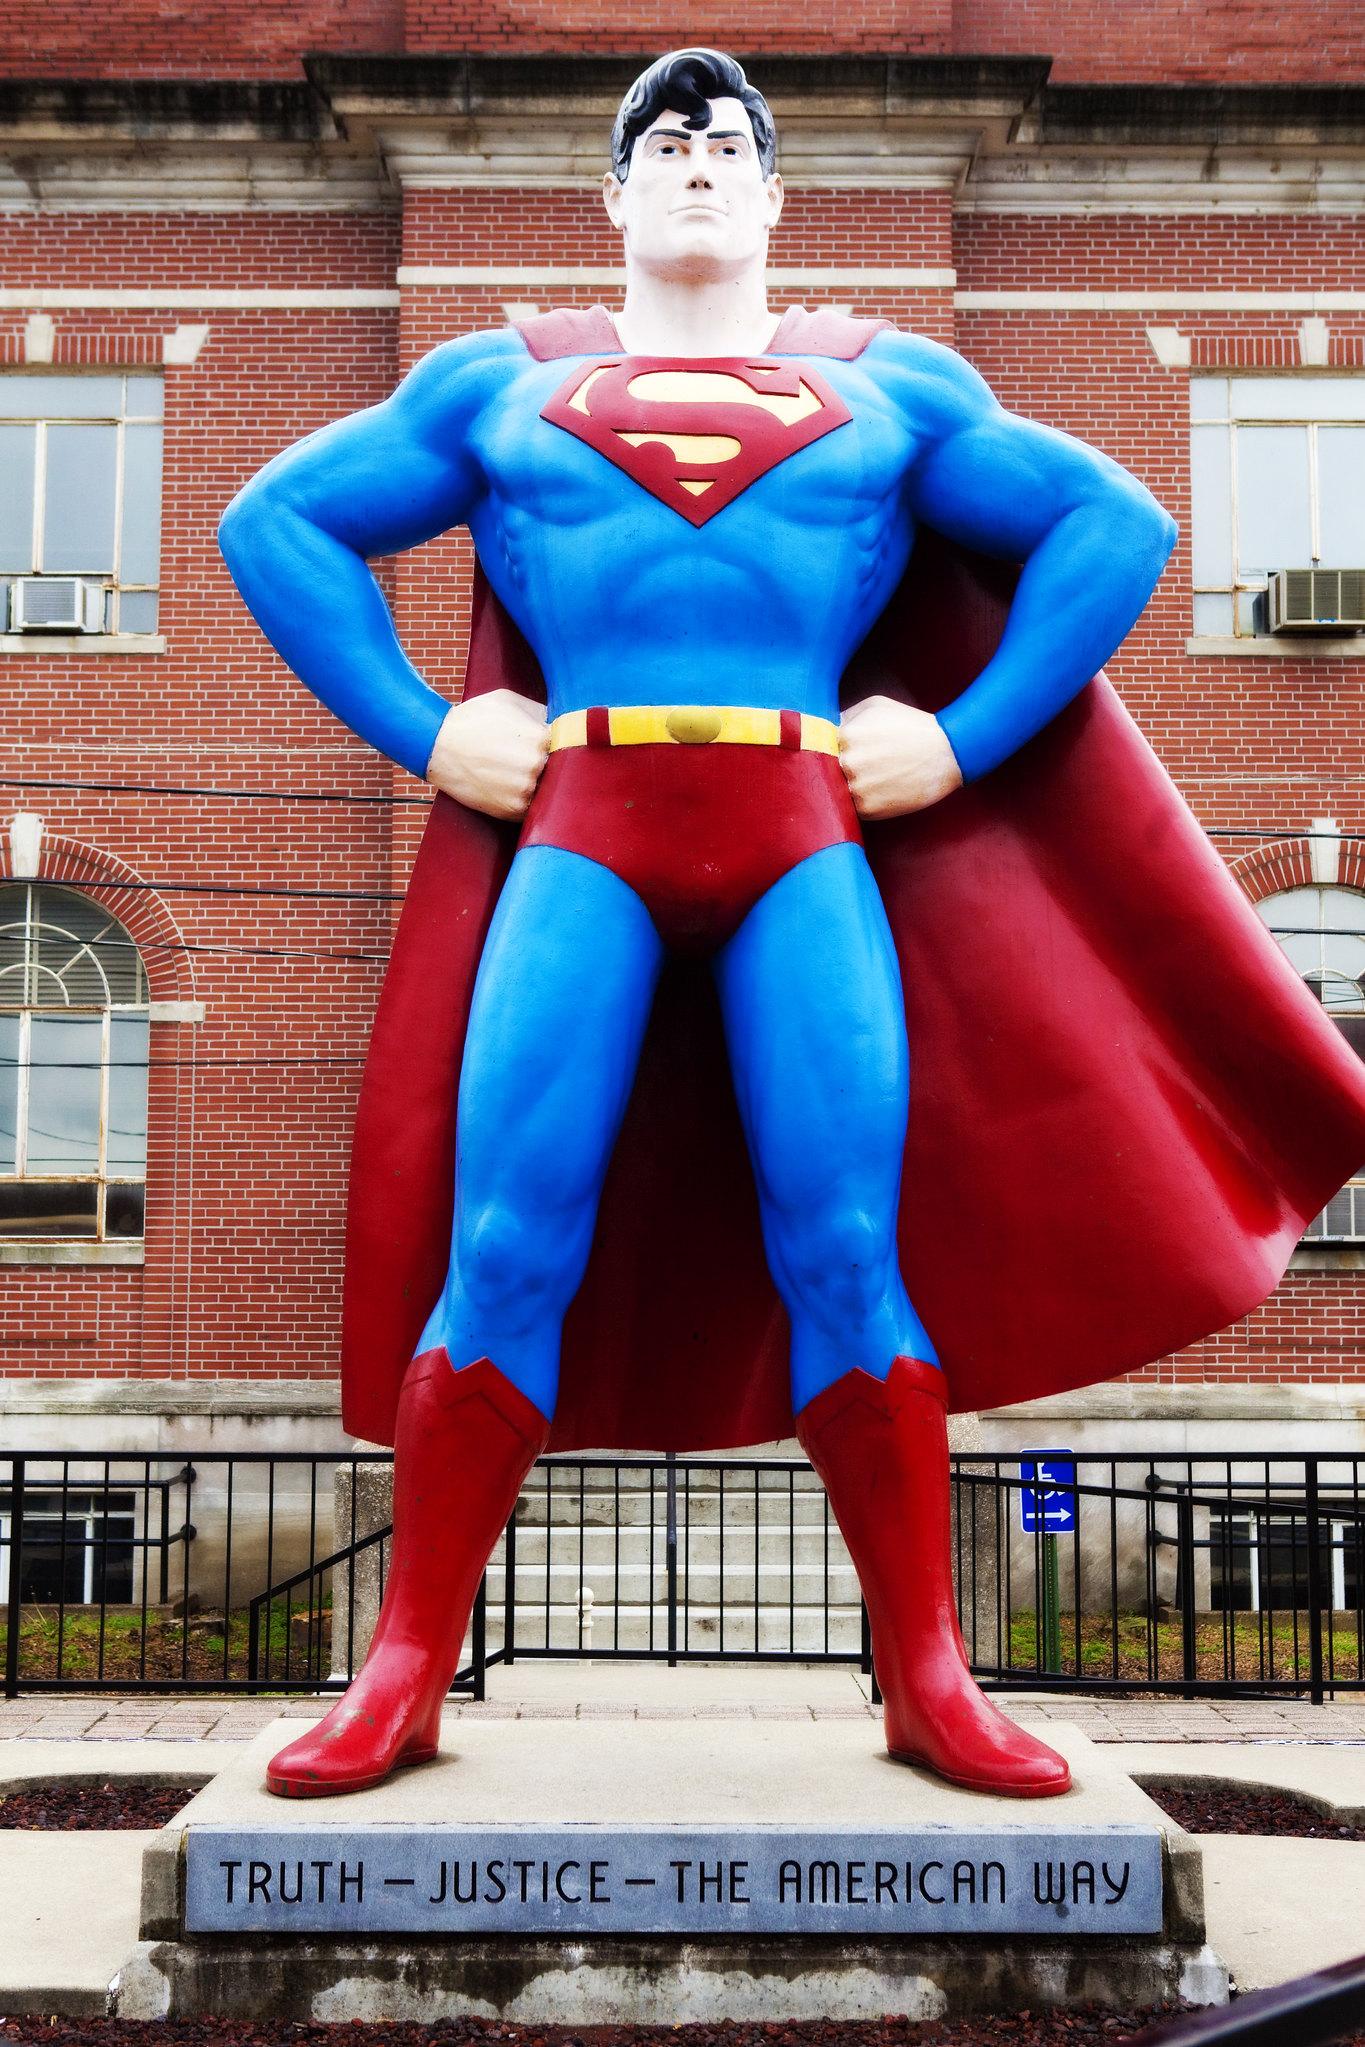 Giant Superman statue, a roadside attraction in Metropolis, Illinois.